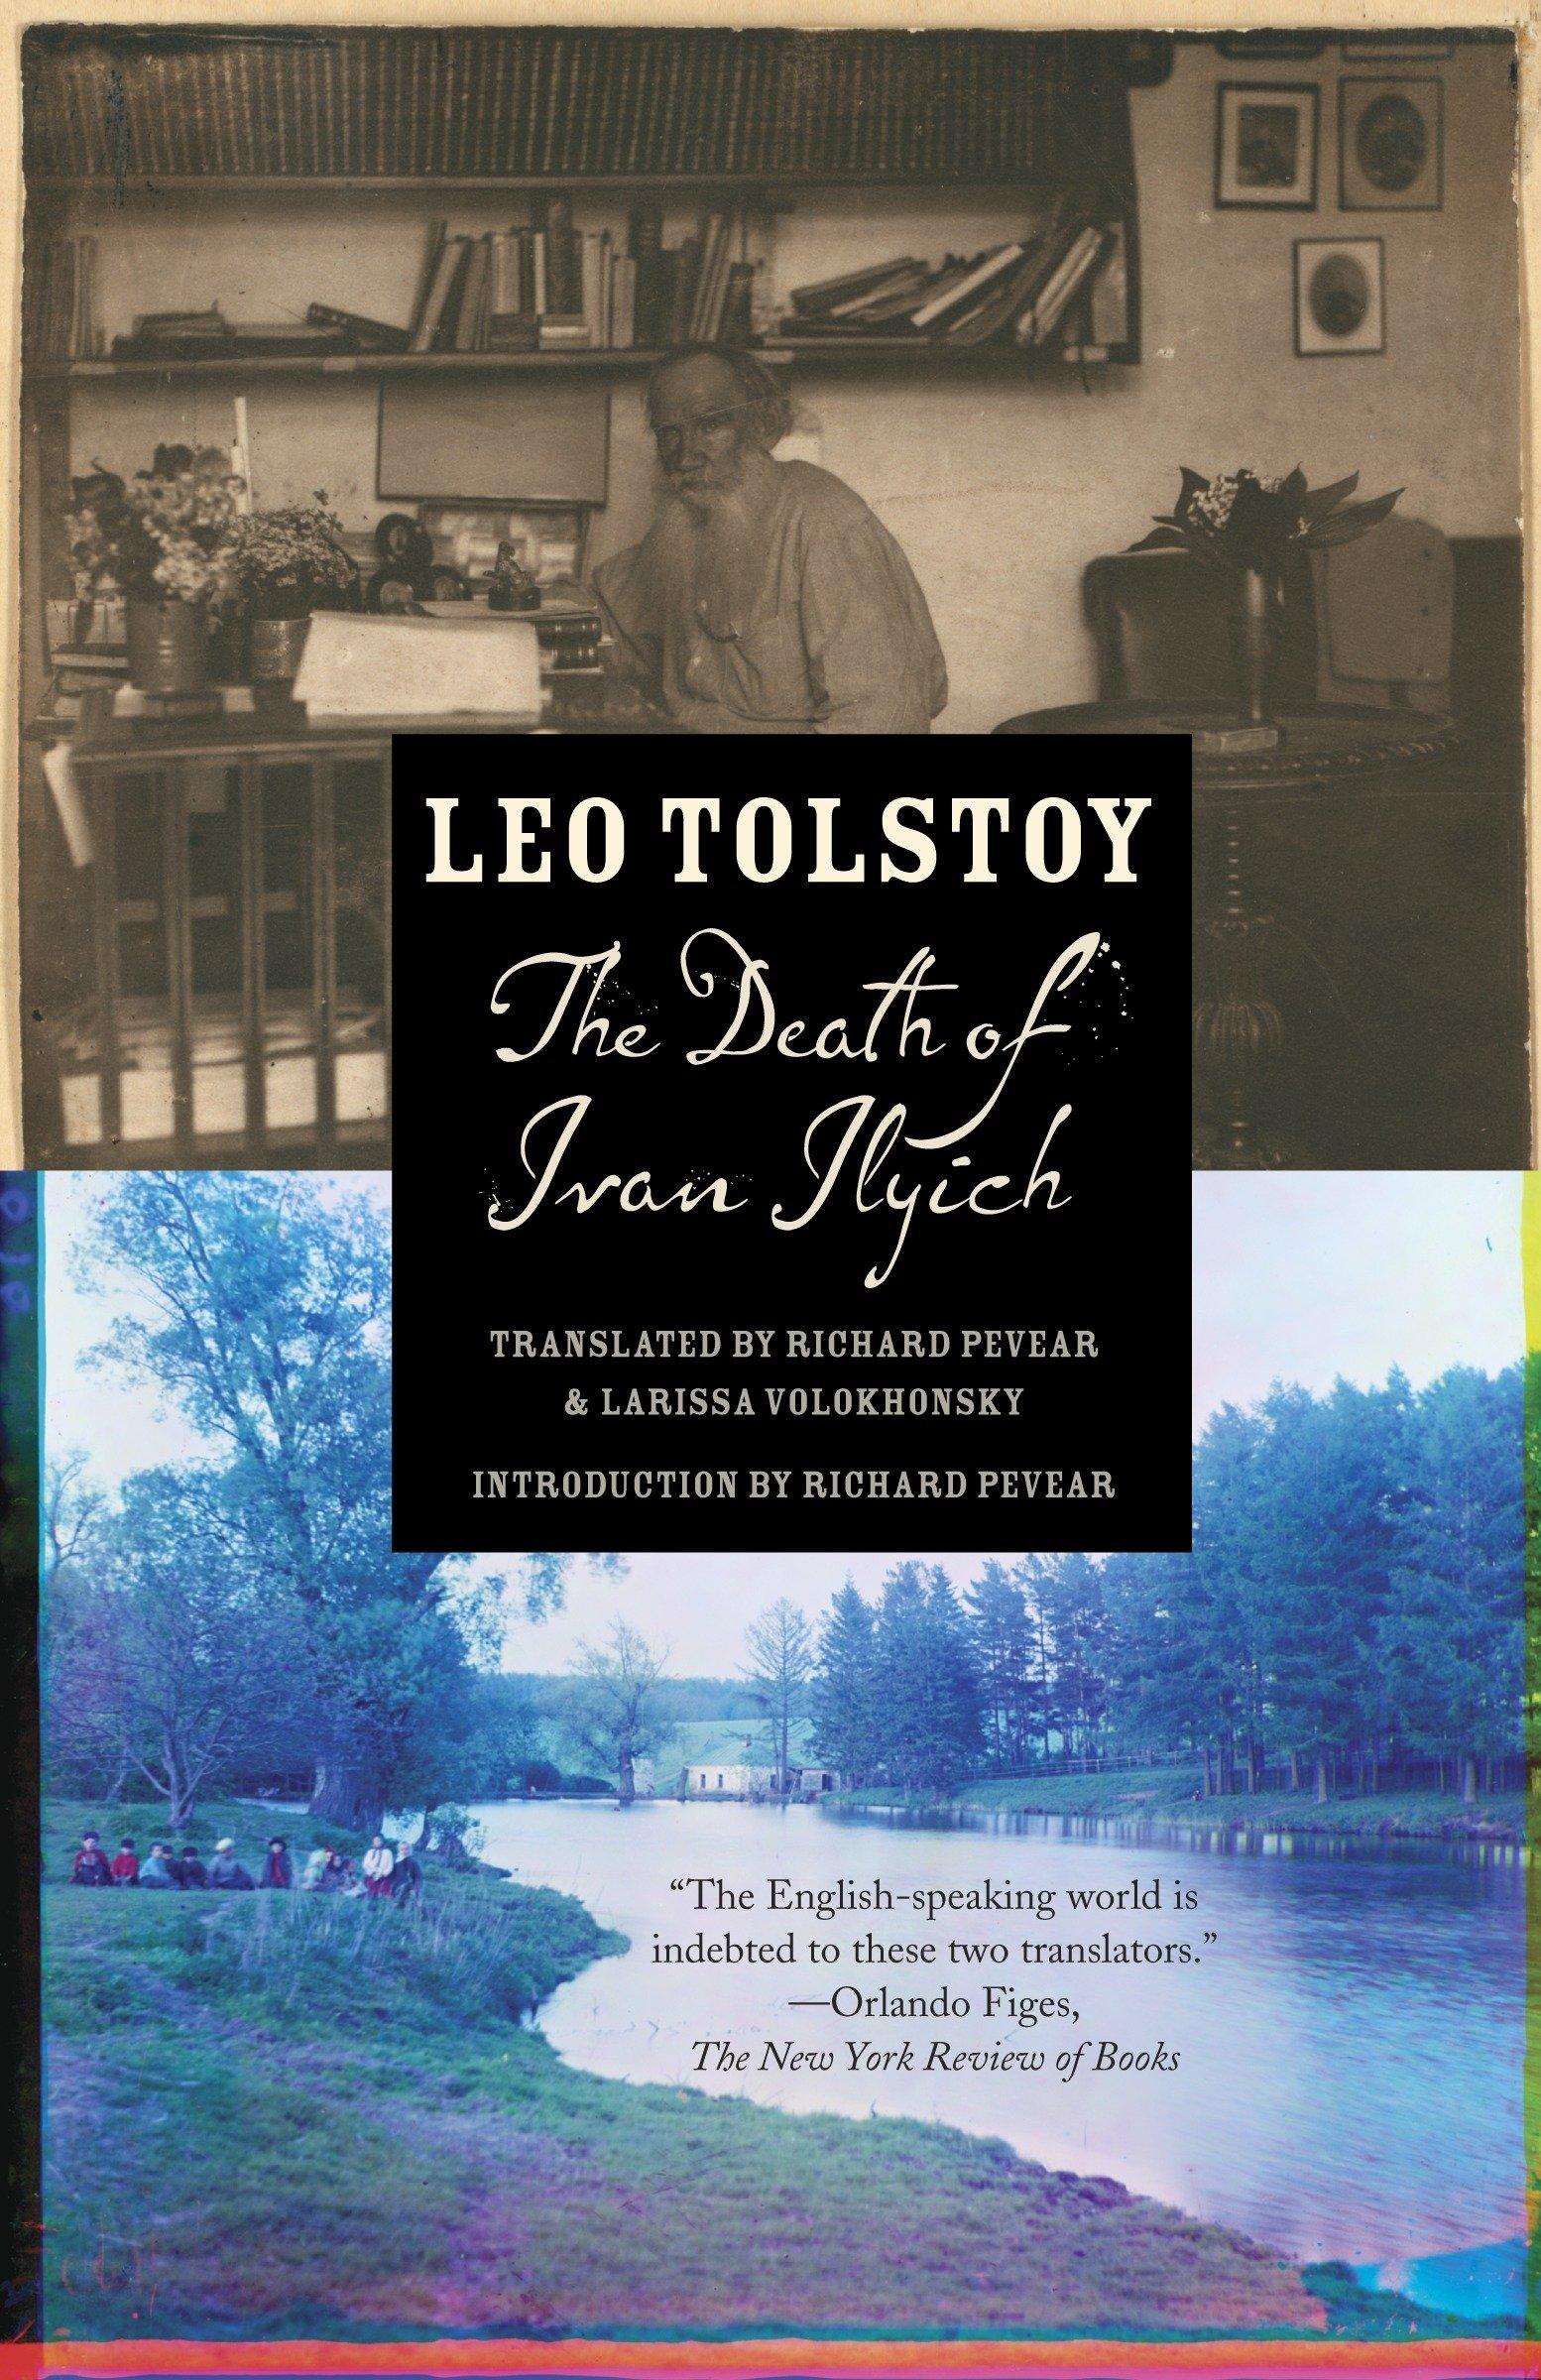 the death of ivan ilyich literary criticism